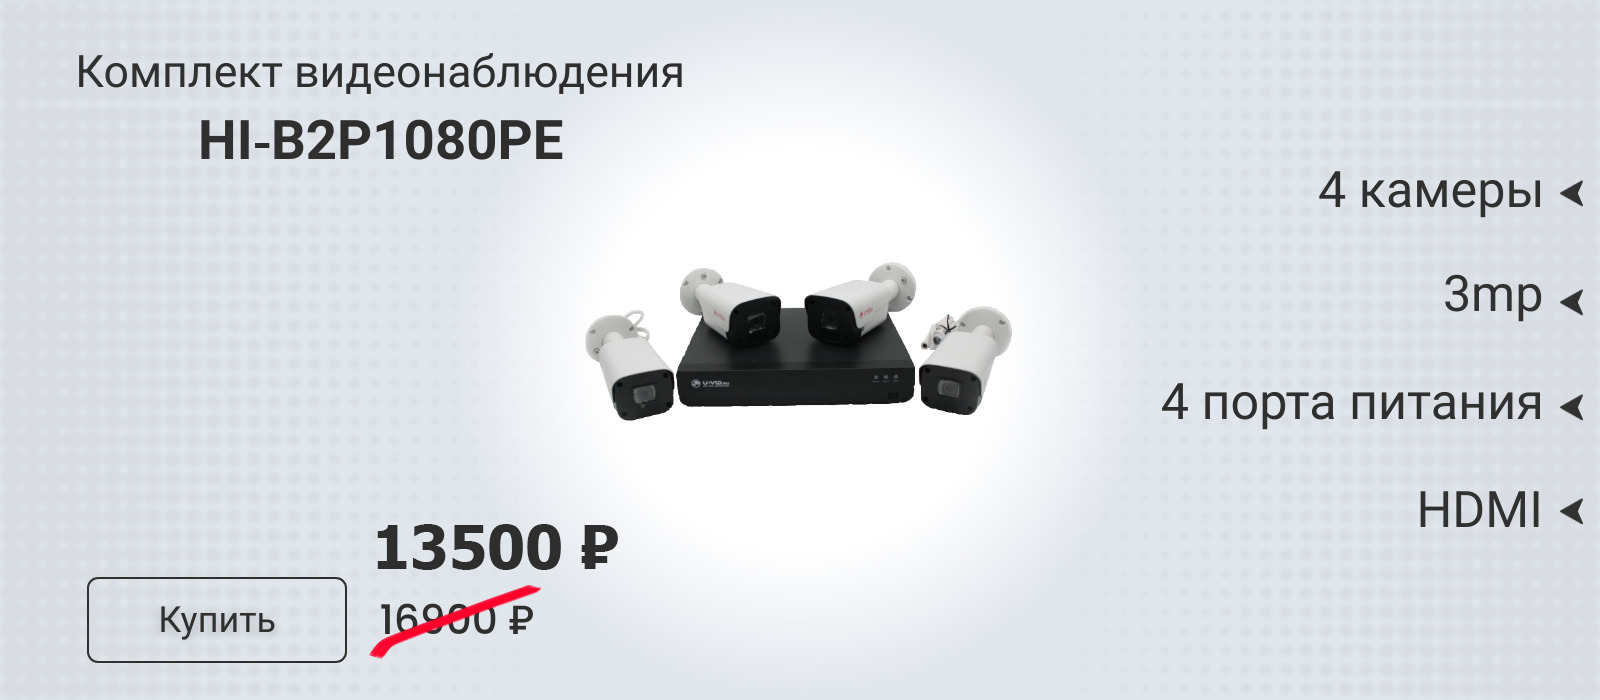 topSlideTwo13500